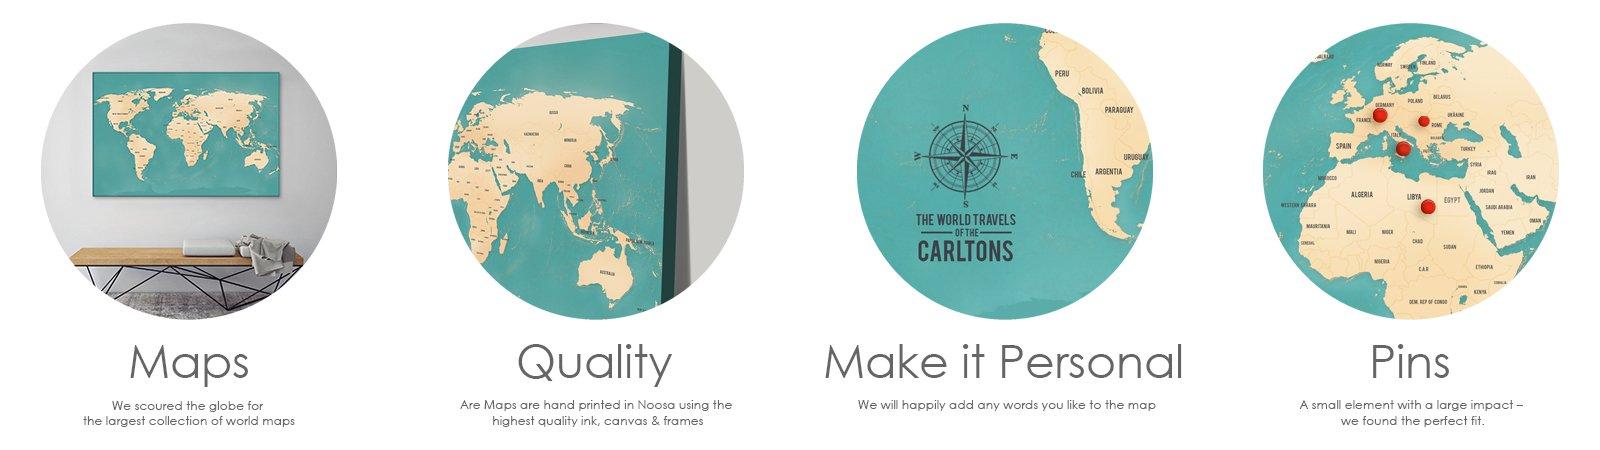 Push Pin World Travel Maps Art